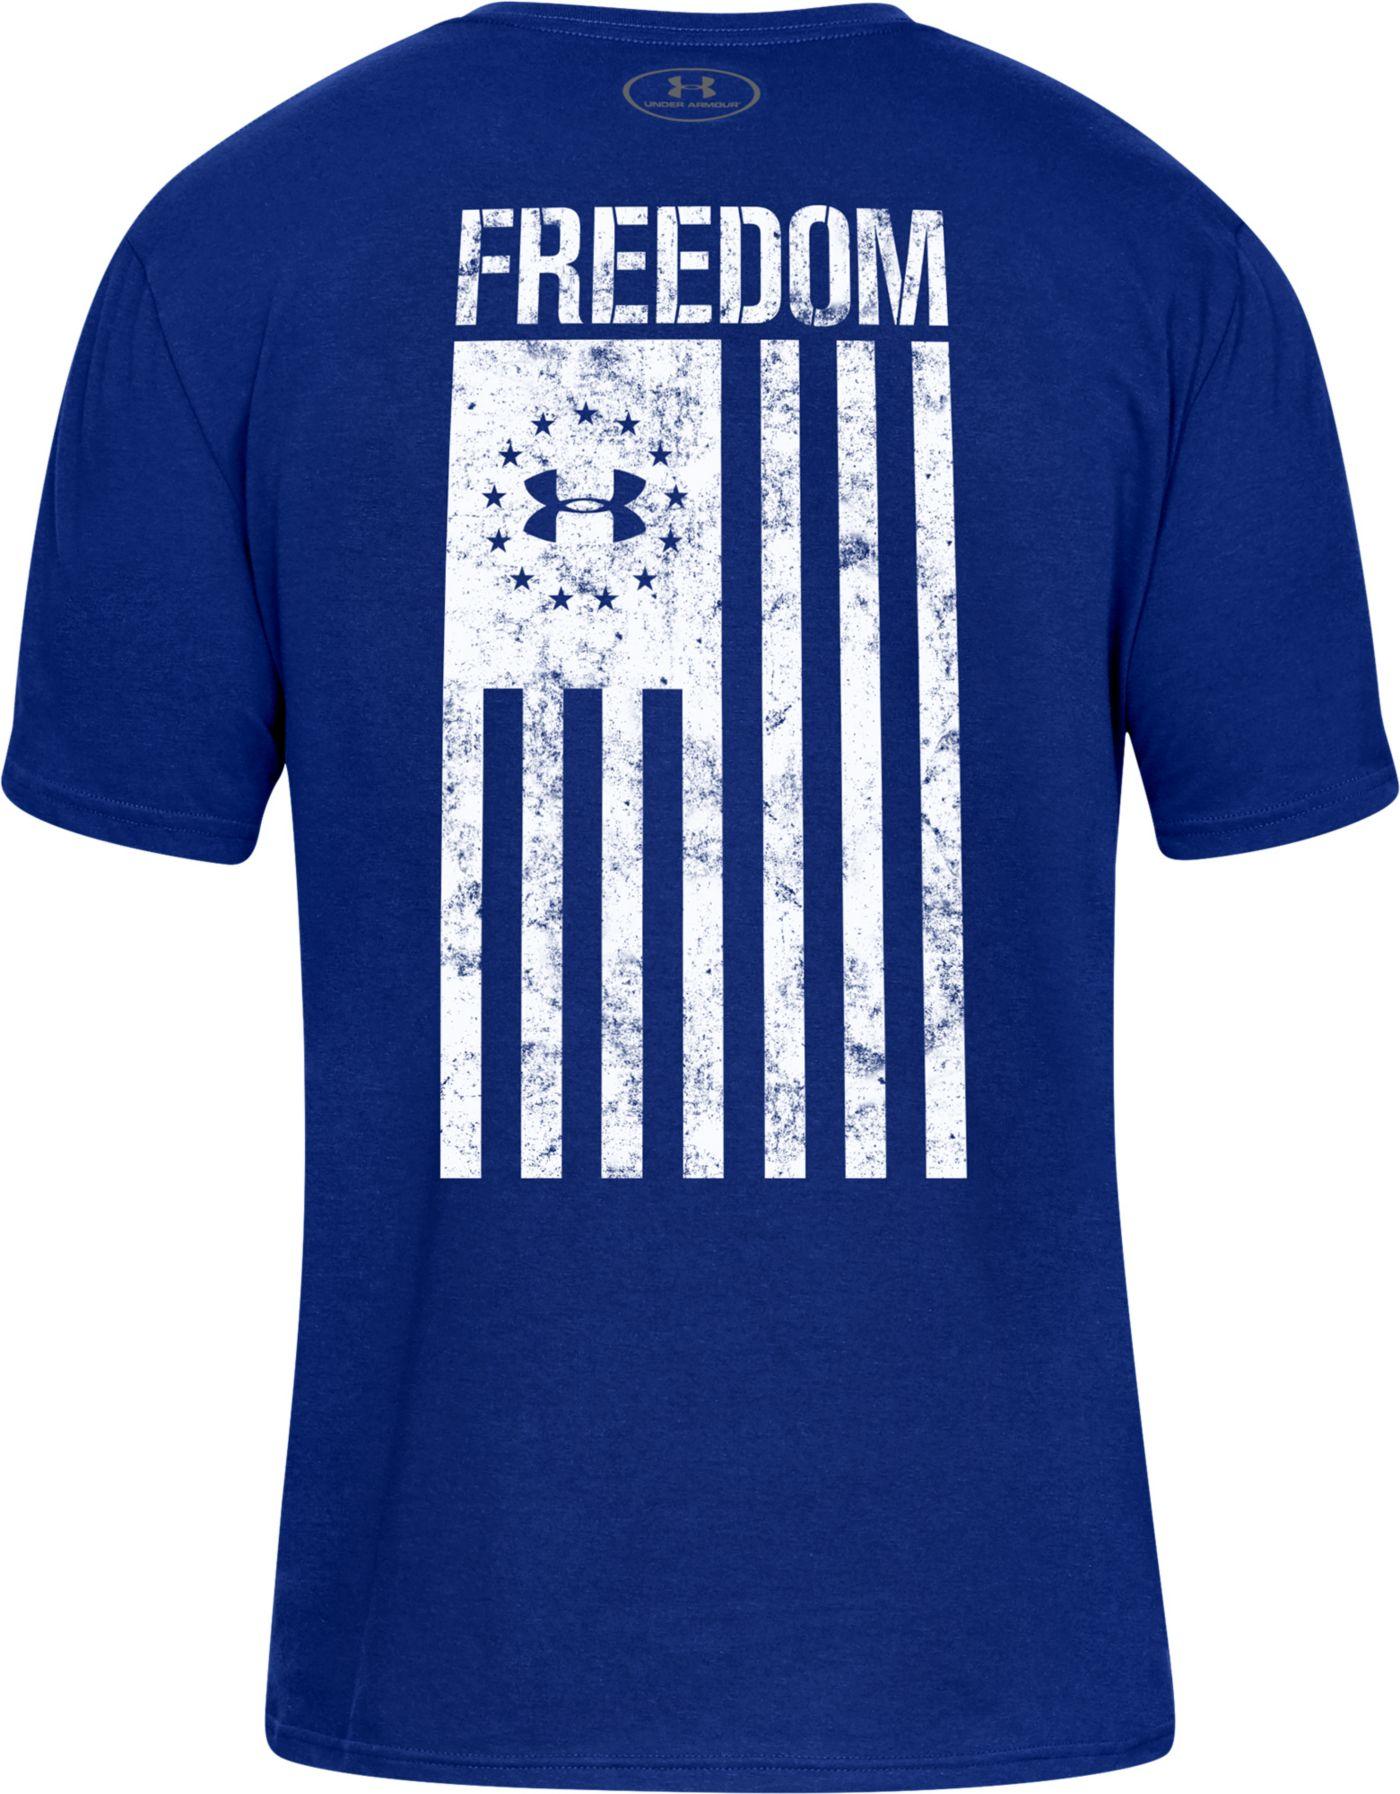 Under Amour Men's Freedom Flag T-Shirt